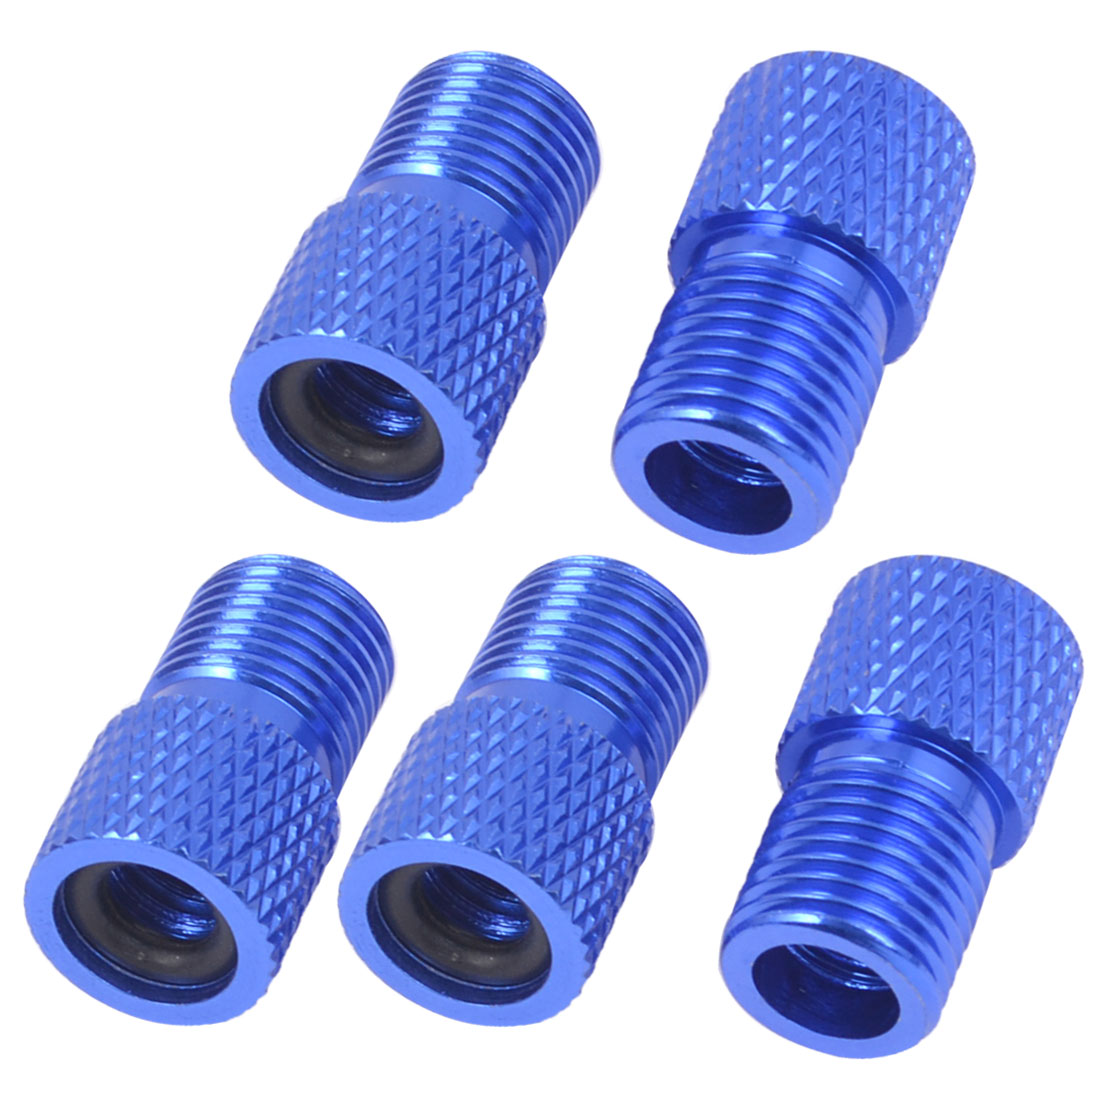 5 Pcs Bicycle Tube Pump Blue Aluminium Alloy Valve Adaptors Converters